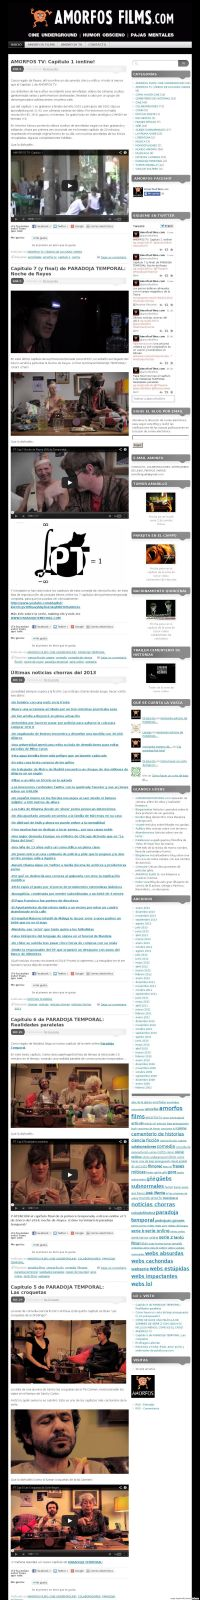 diseñoamorfiano_2013-2015